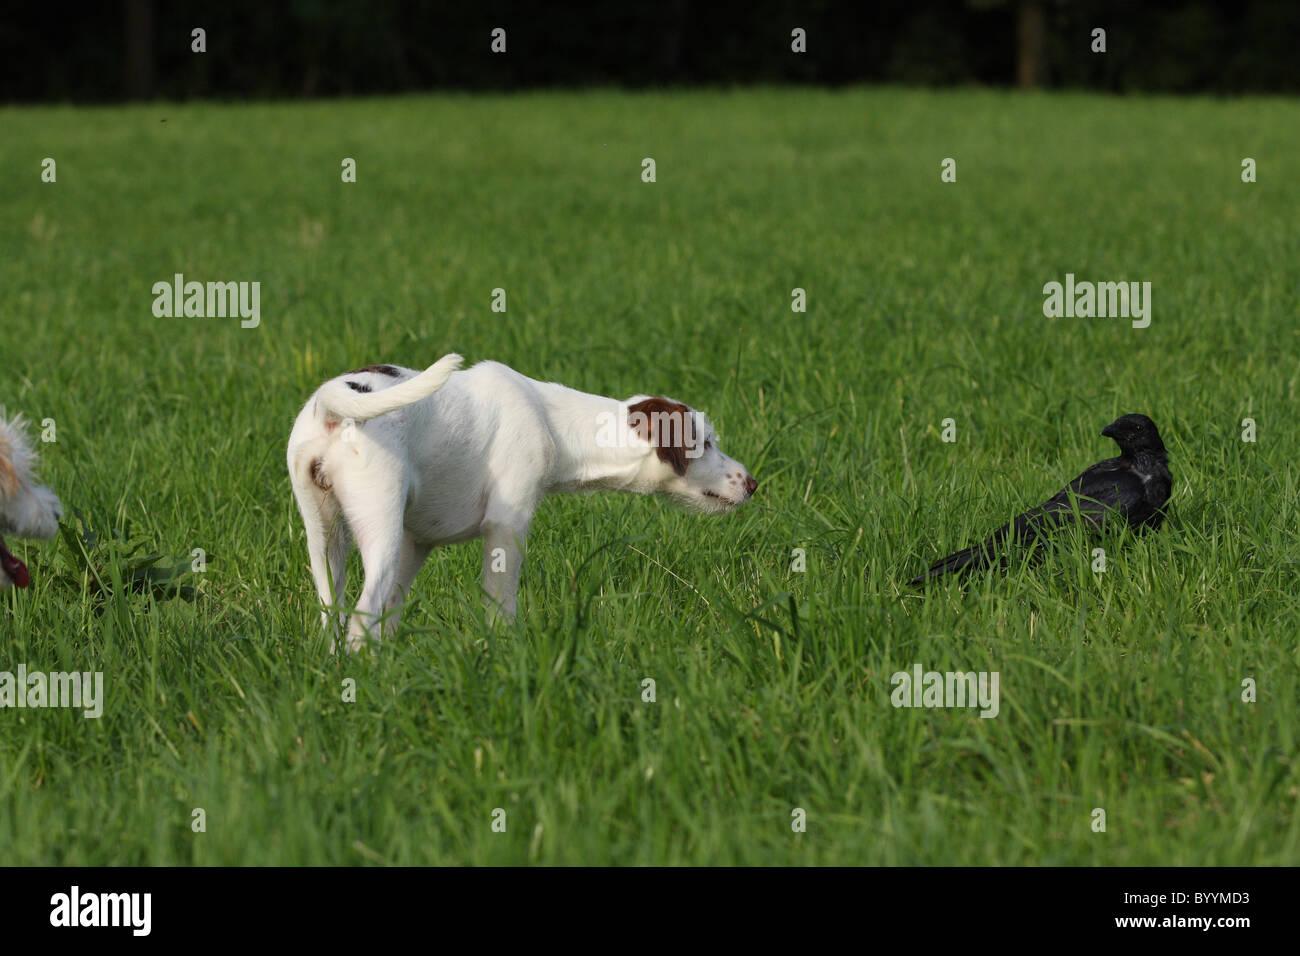 dog and bird - Stock Image